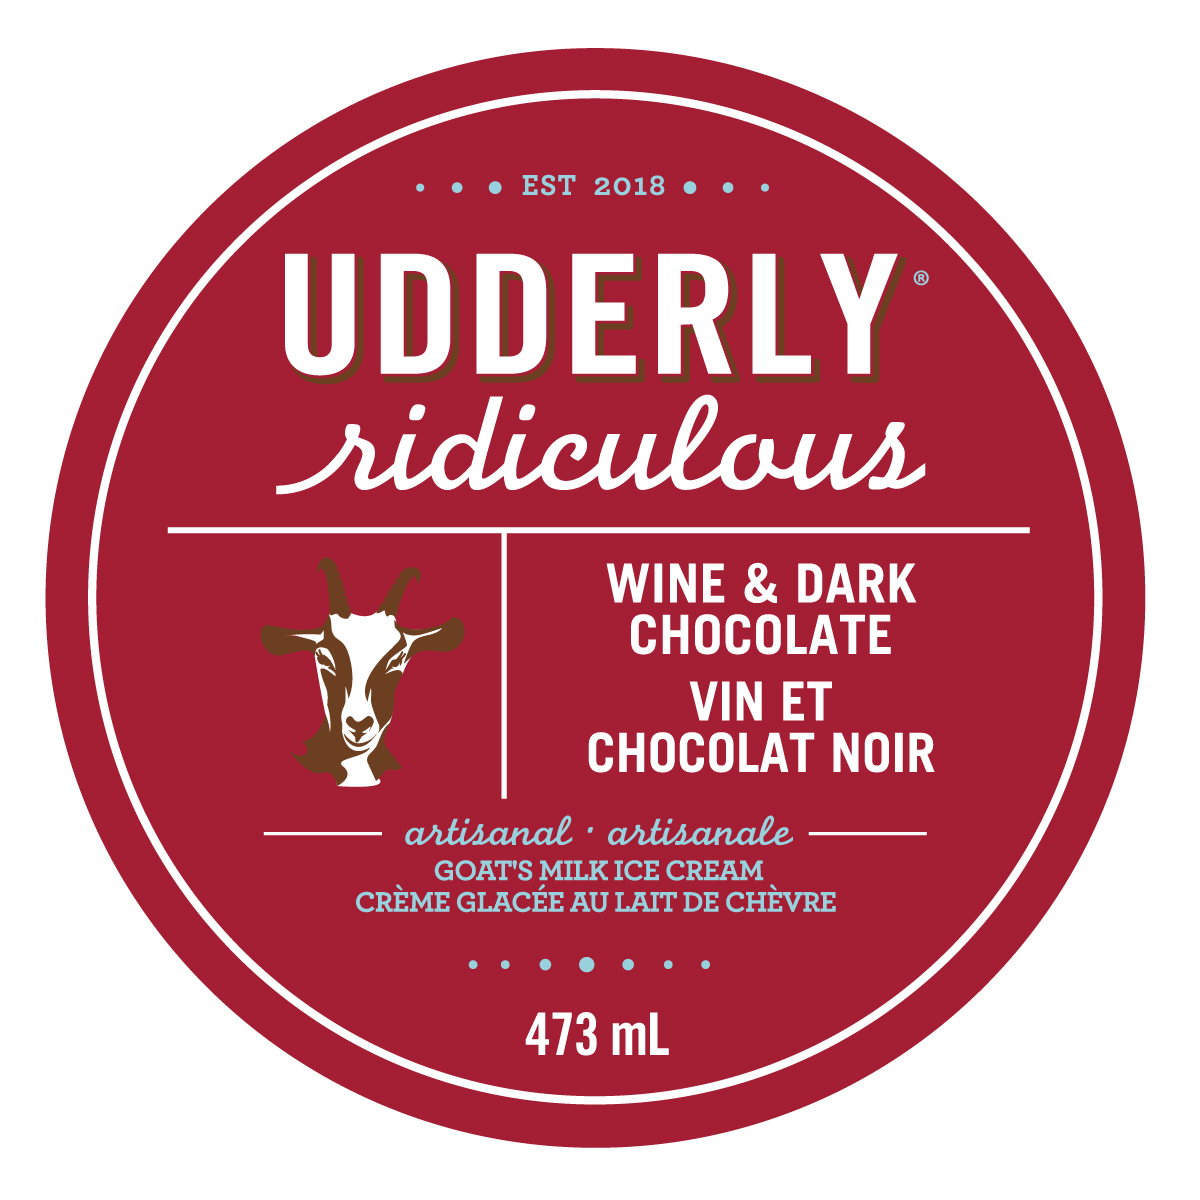 Udderly_RedWine&Chocolate.jpg